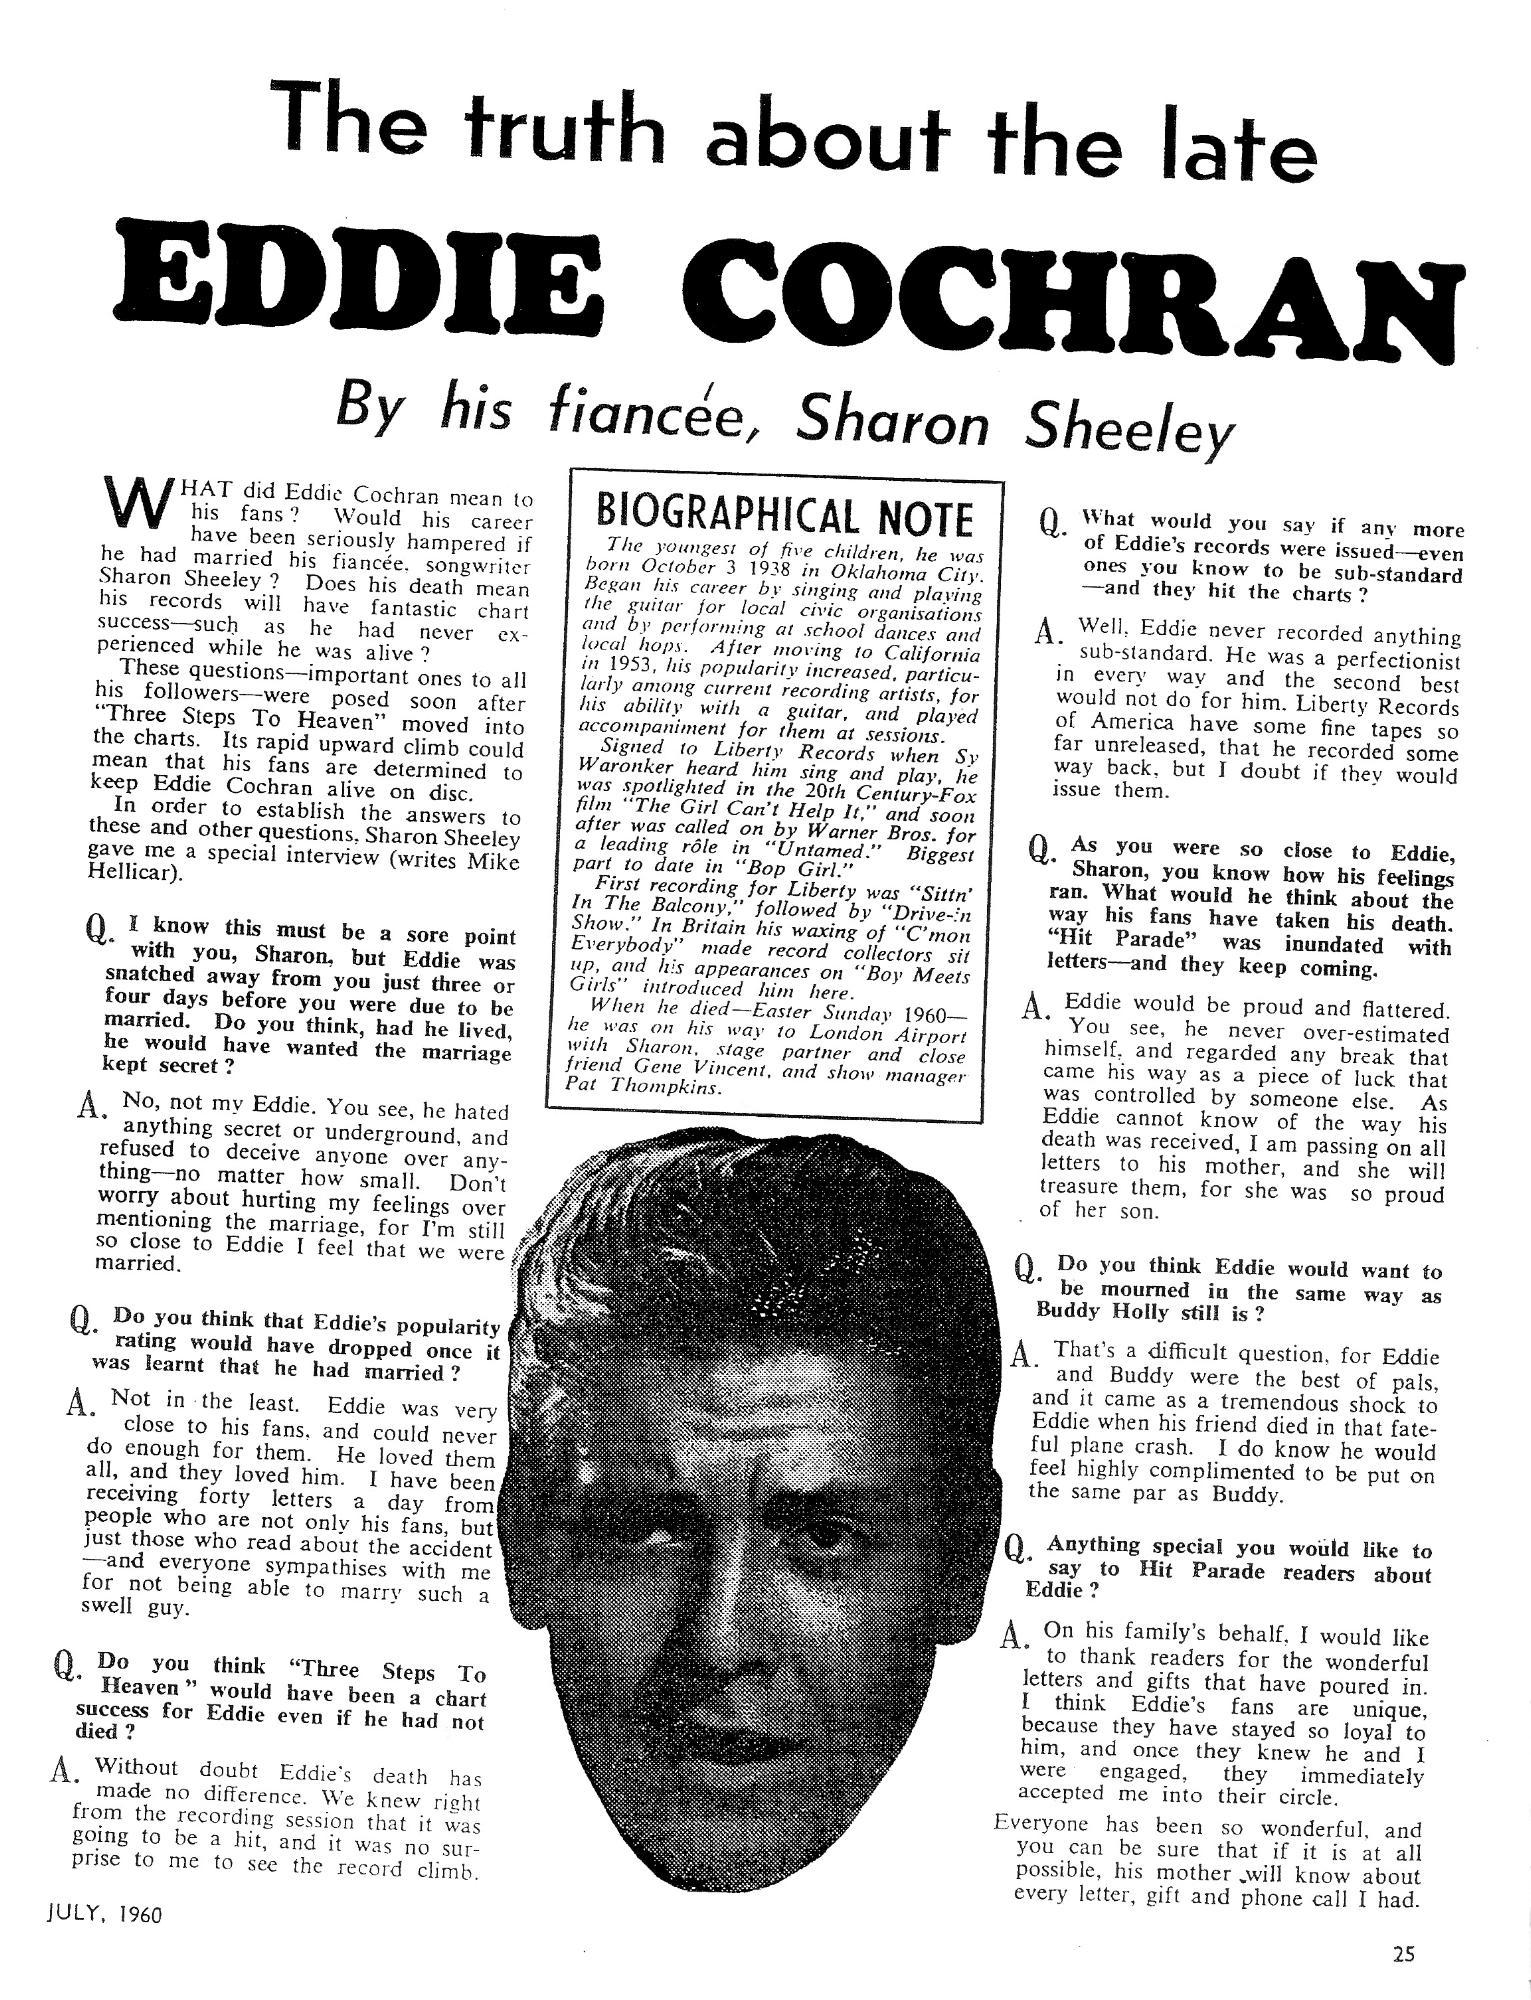 28111_Hit_Parade_magazine_July_1960_2_1_122_355lo.jpg